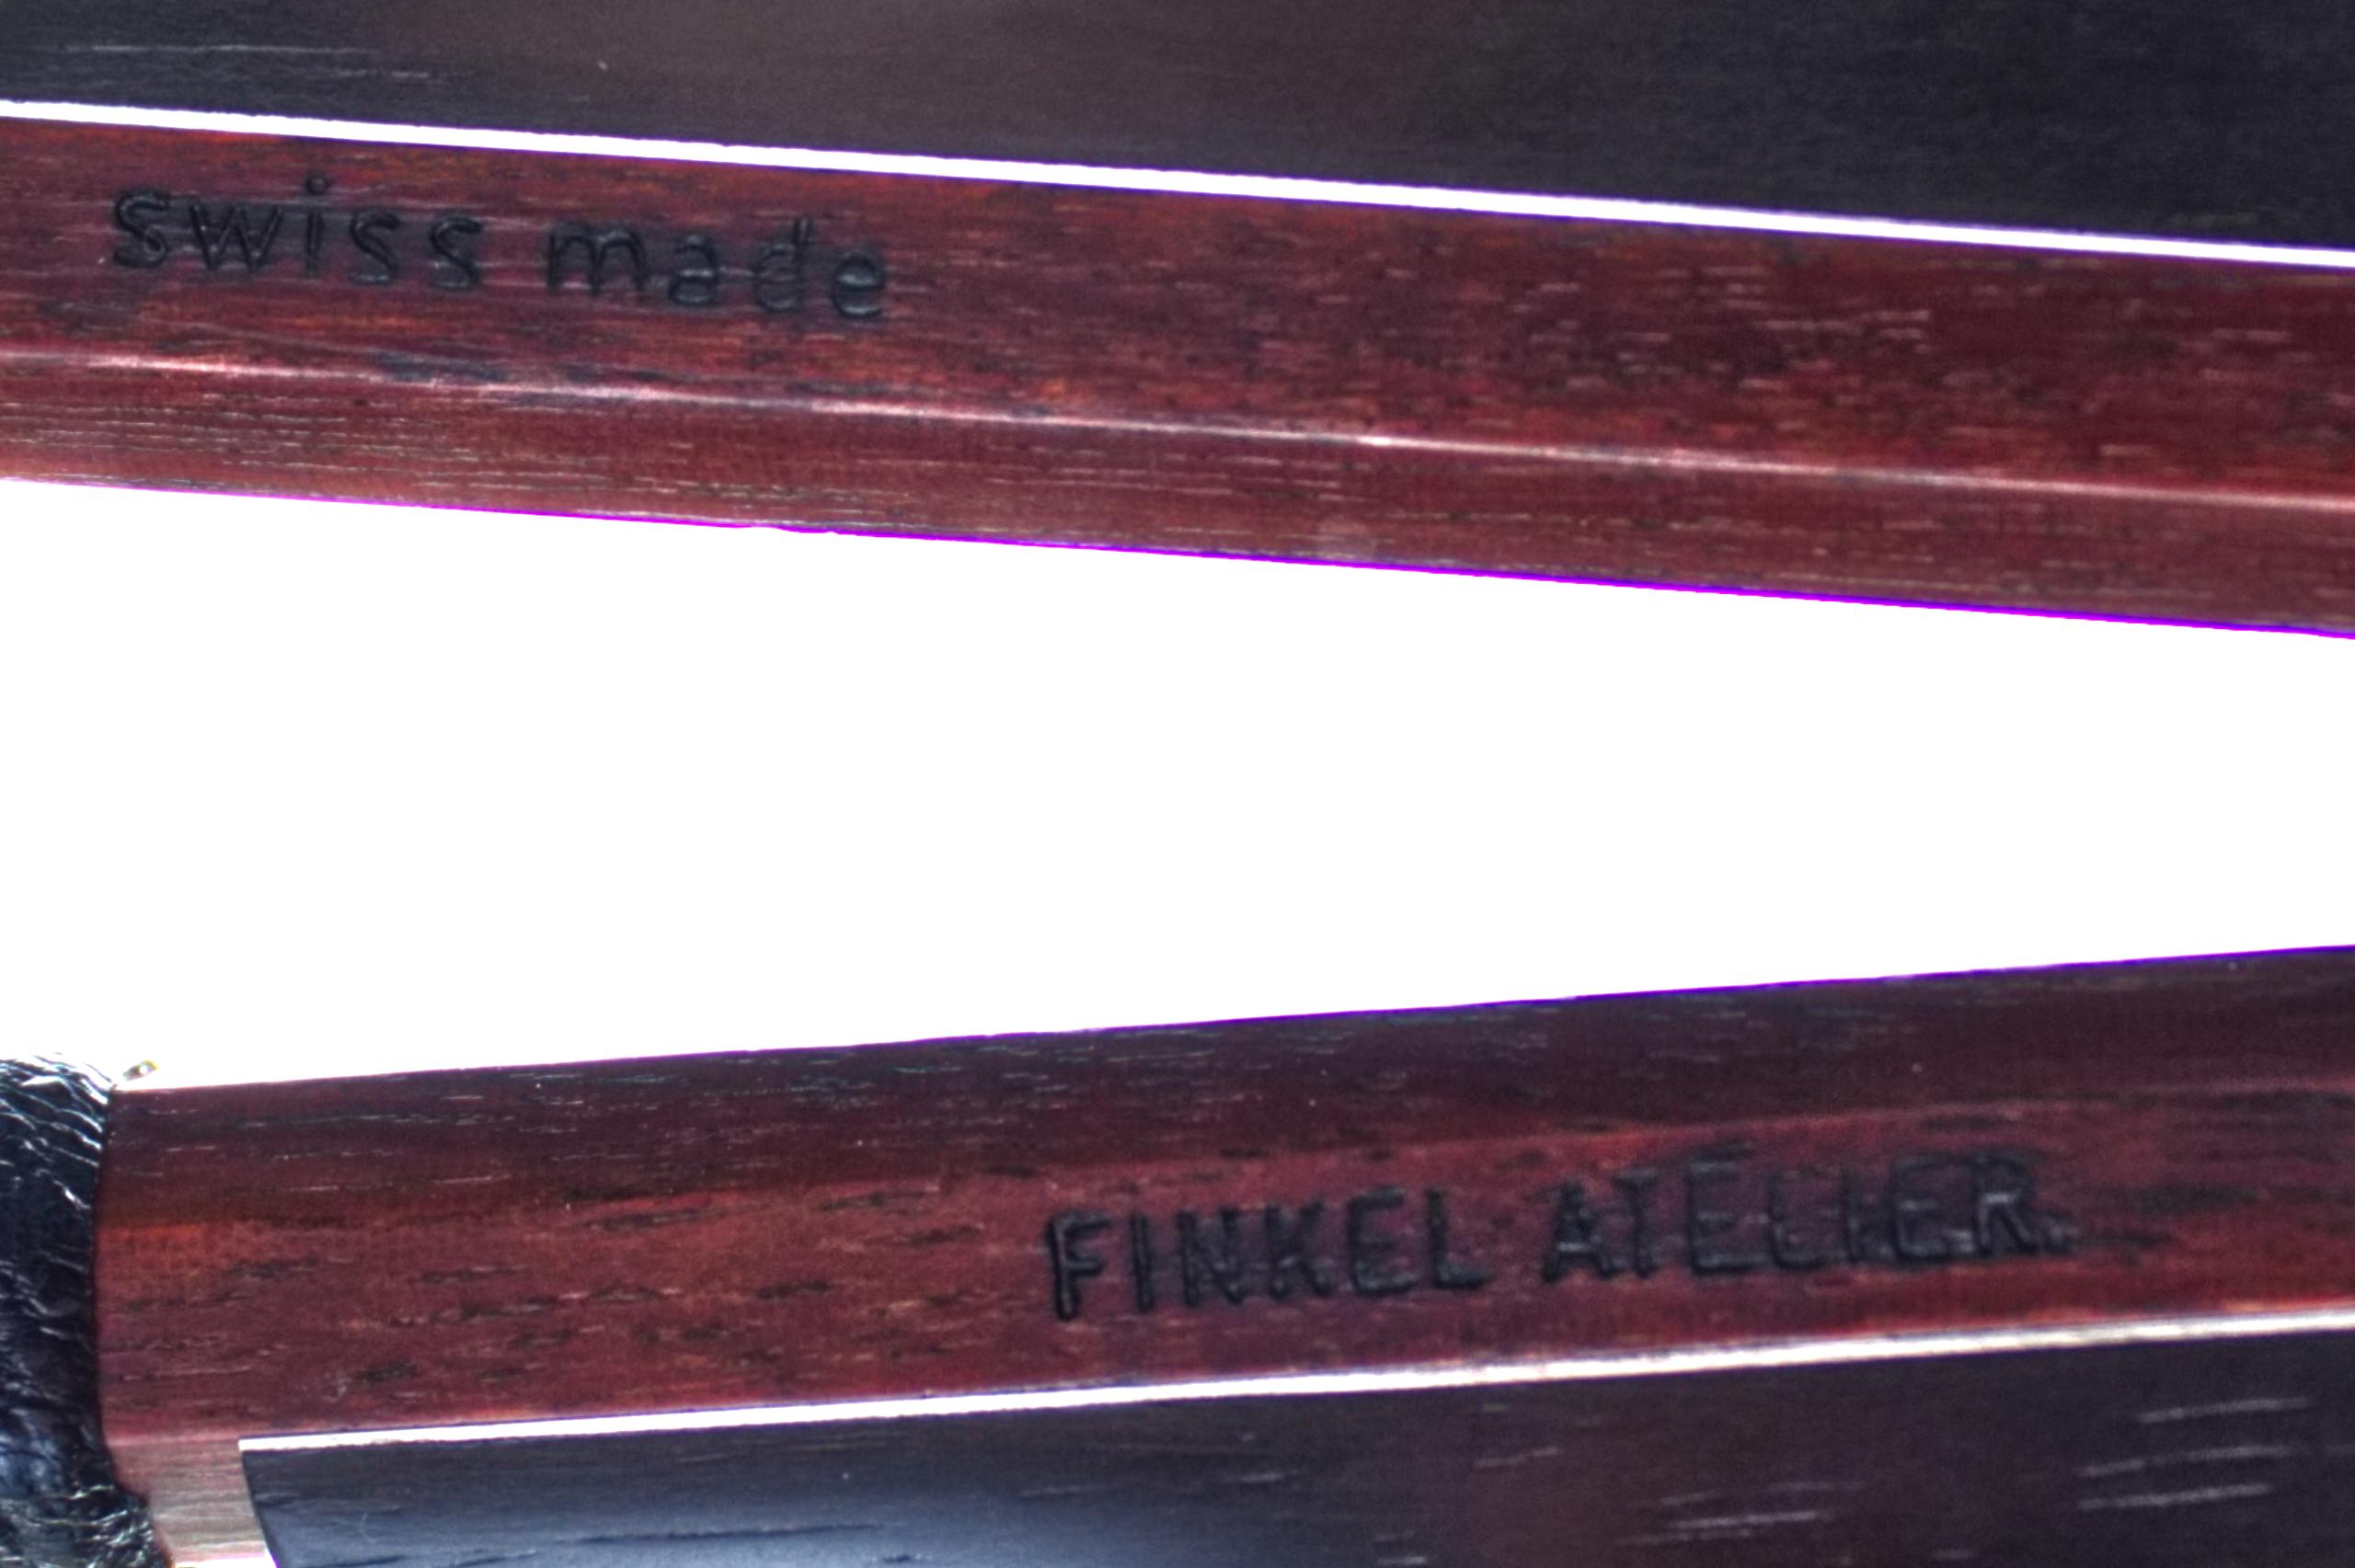 Finkel Bows